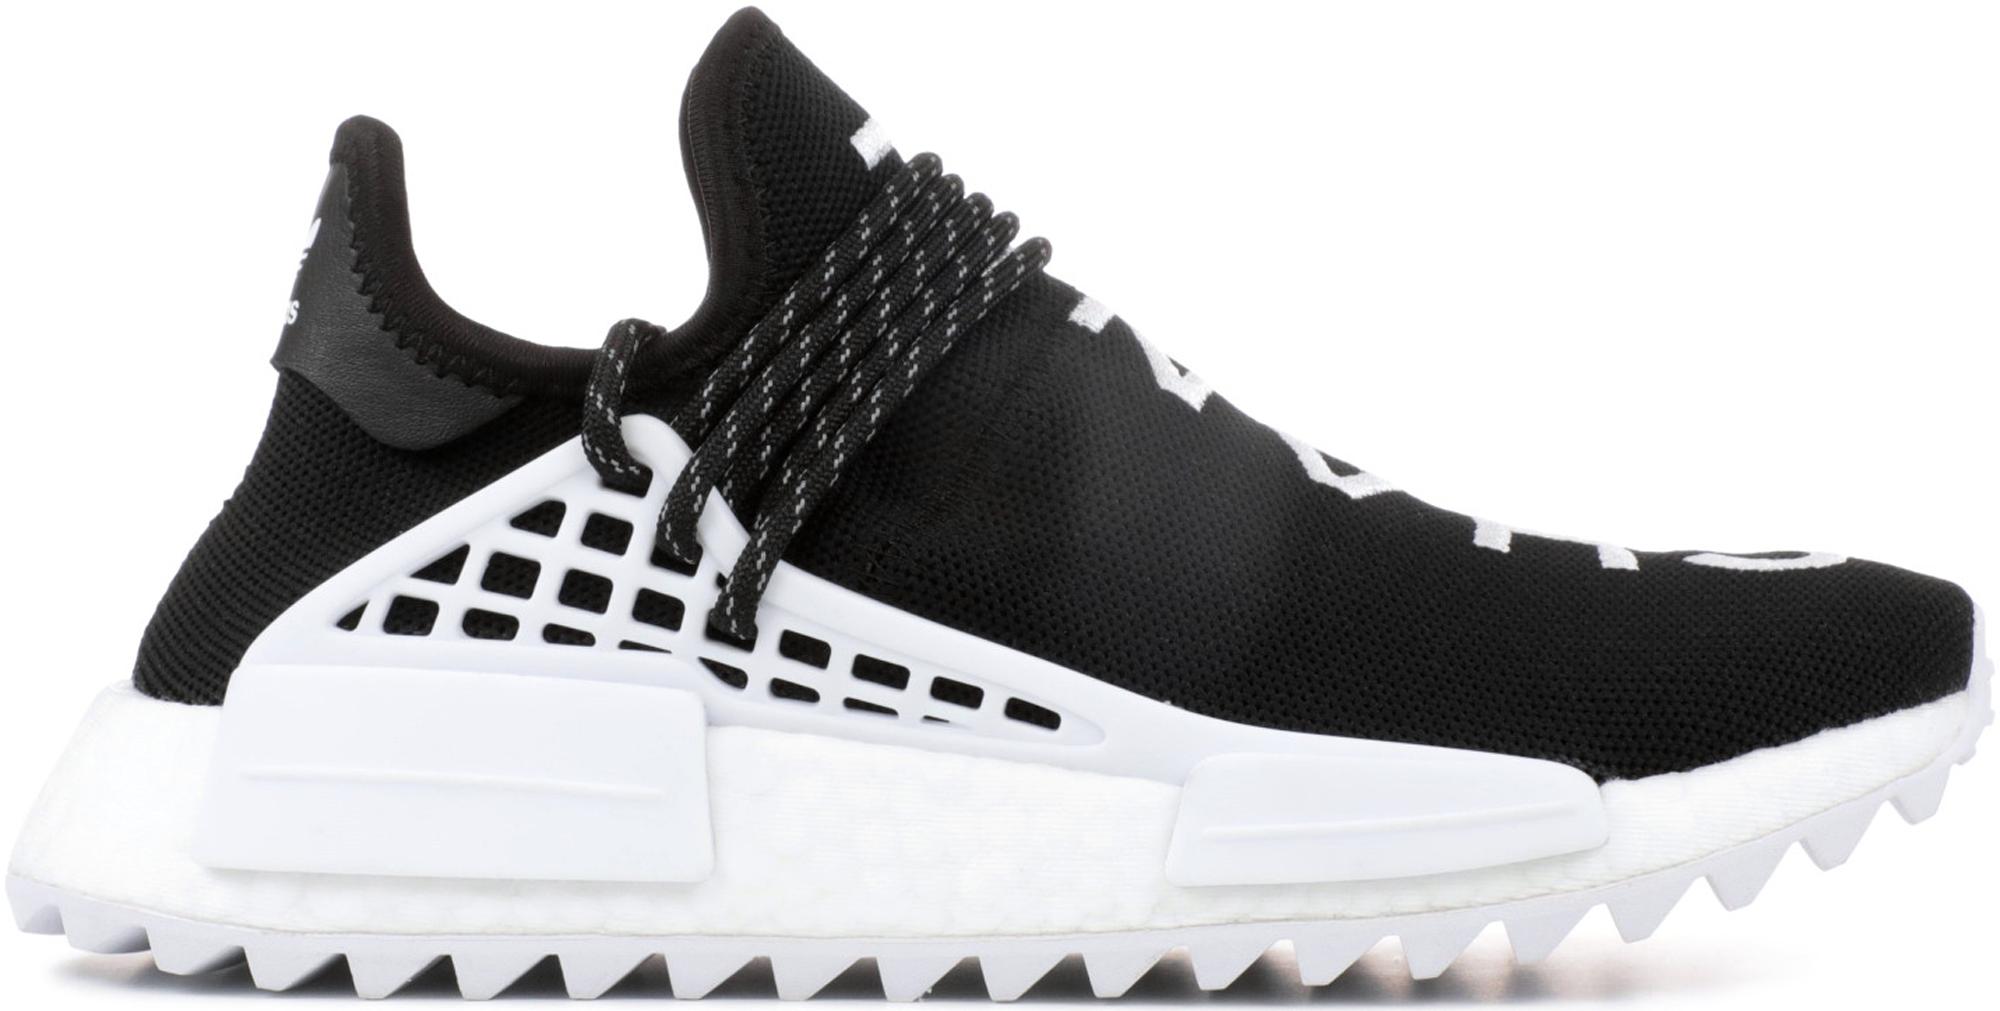 adidas Human Race NMD Pharrell x Chanel (Sample)